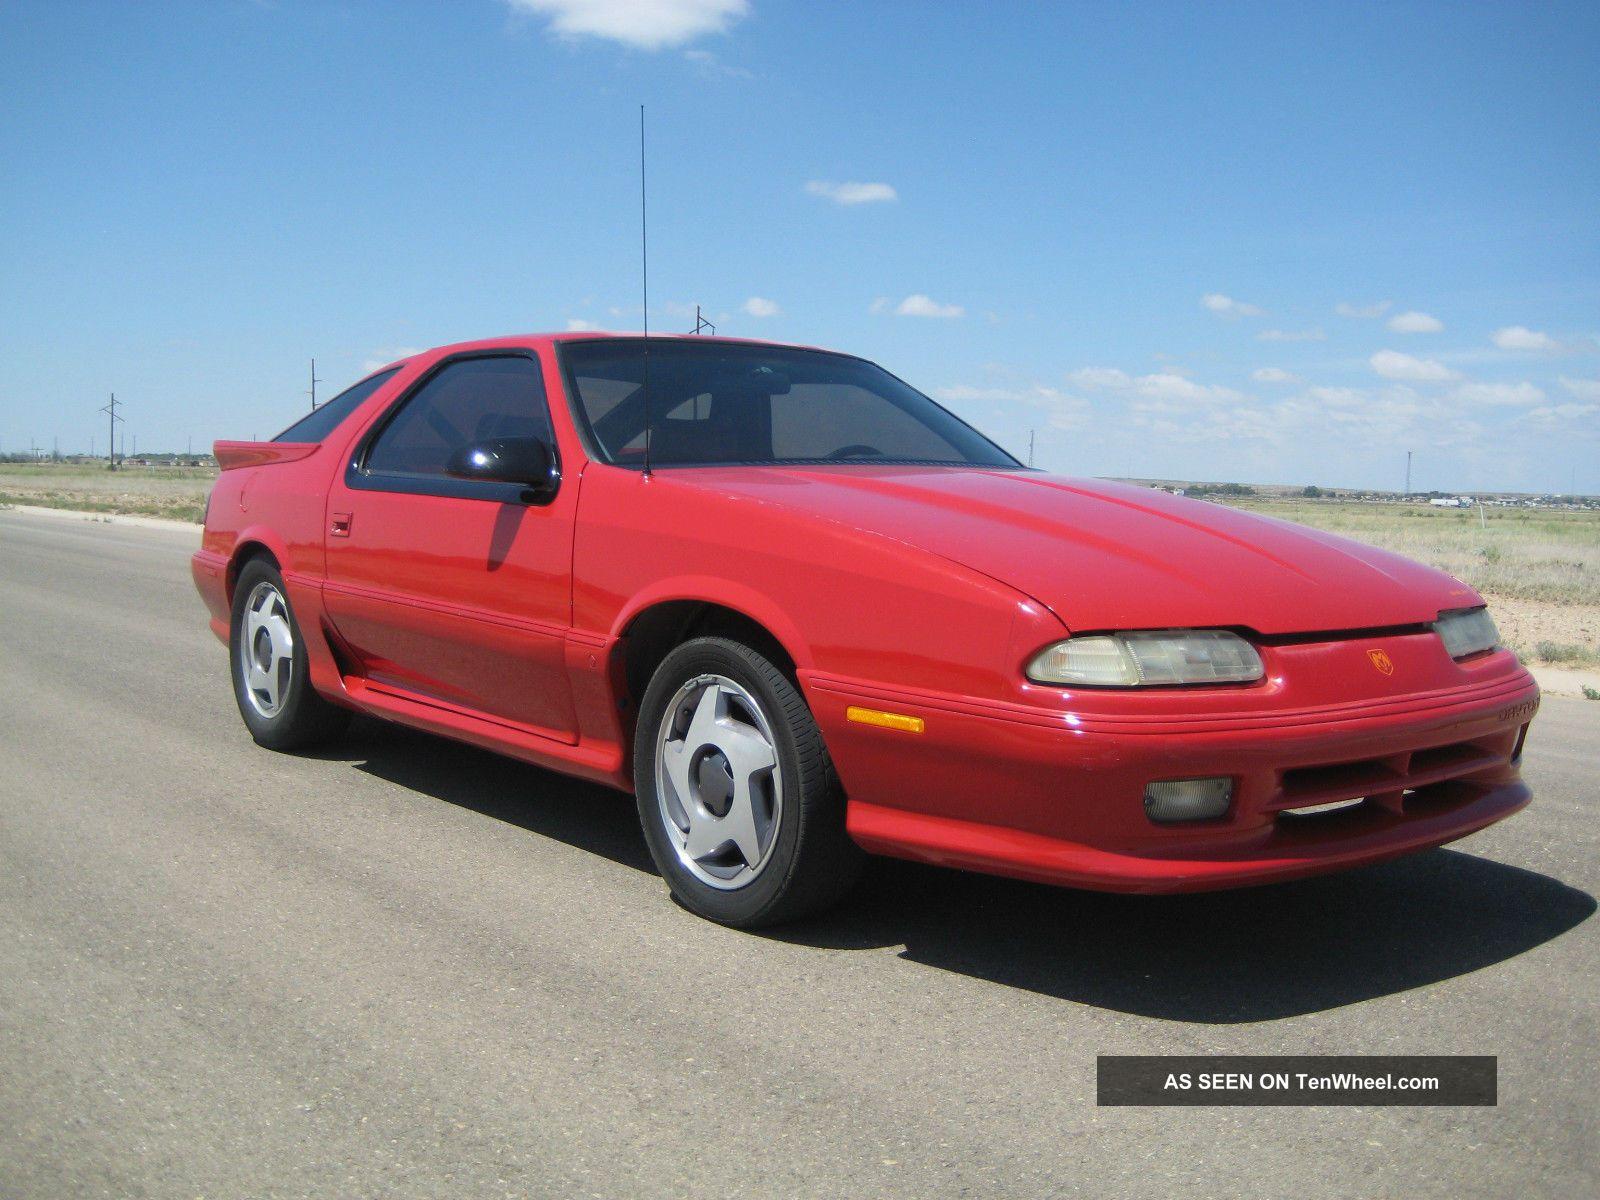 1992 Dodge Daytona Iroc Shelby 2 5 Turbo 5 Speed